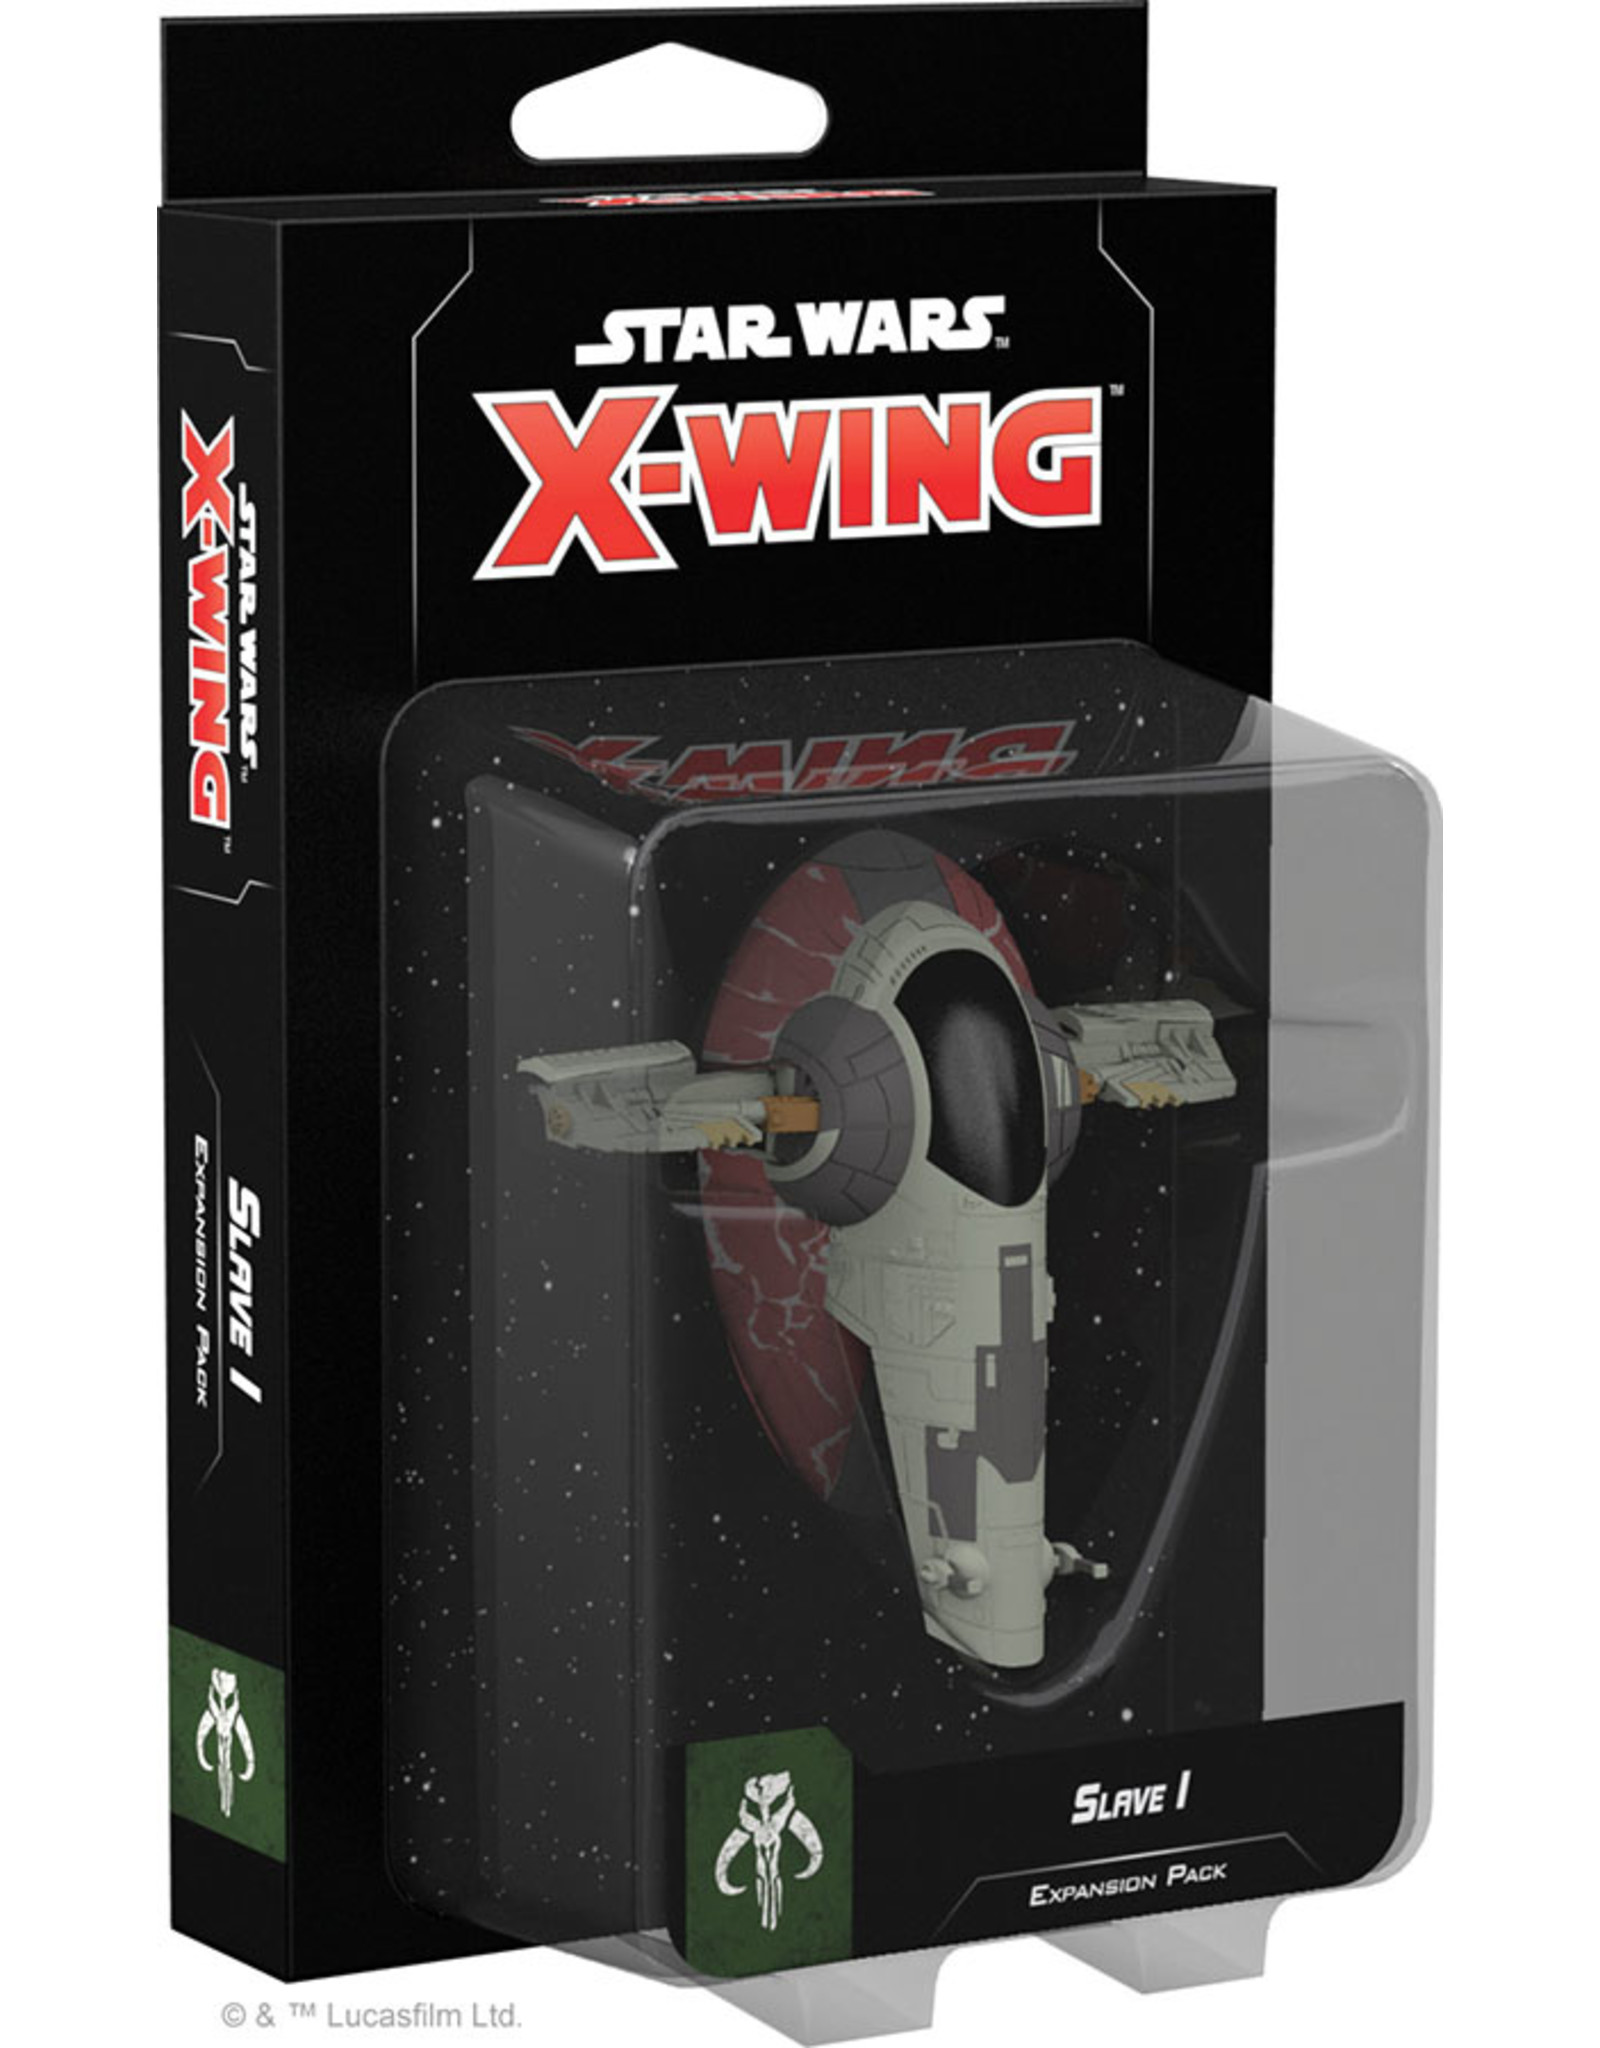 Fantasy Flight Games Star Wars X-Wing: 2nd Edition - Slave 1 Expansion